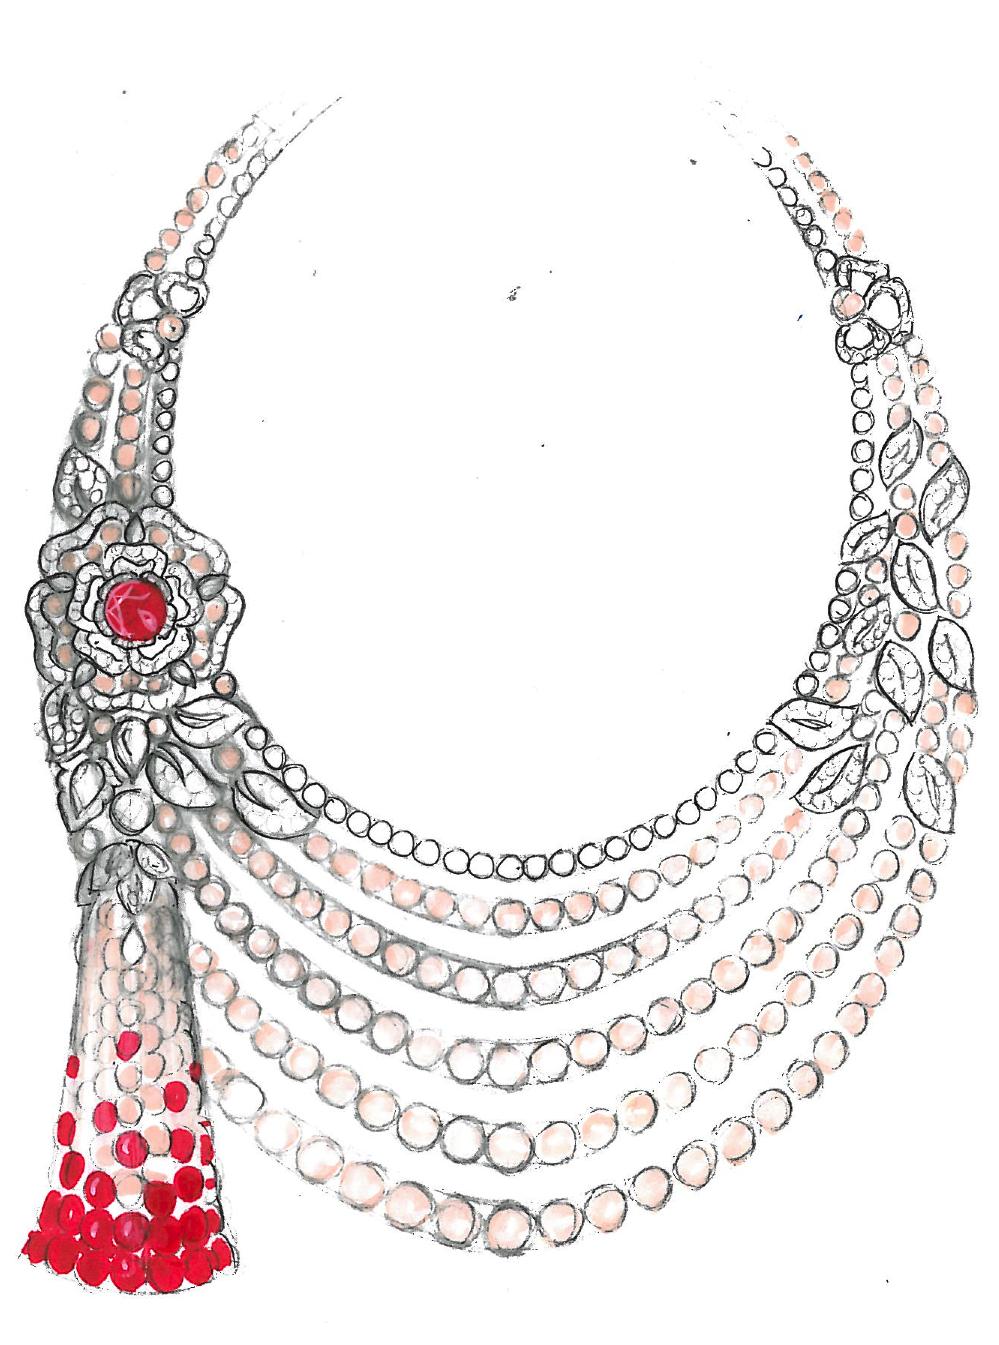 Google Image Result For Https I Pinimg Com Originals 8f Db F0 8fdbf0e3756bfbc4e524f74d2 Jewellery Design Sketches Jewelry Illustration Jewelry Design Drawing